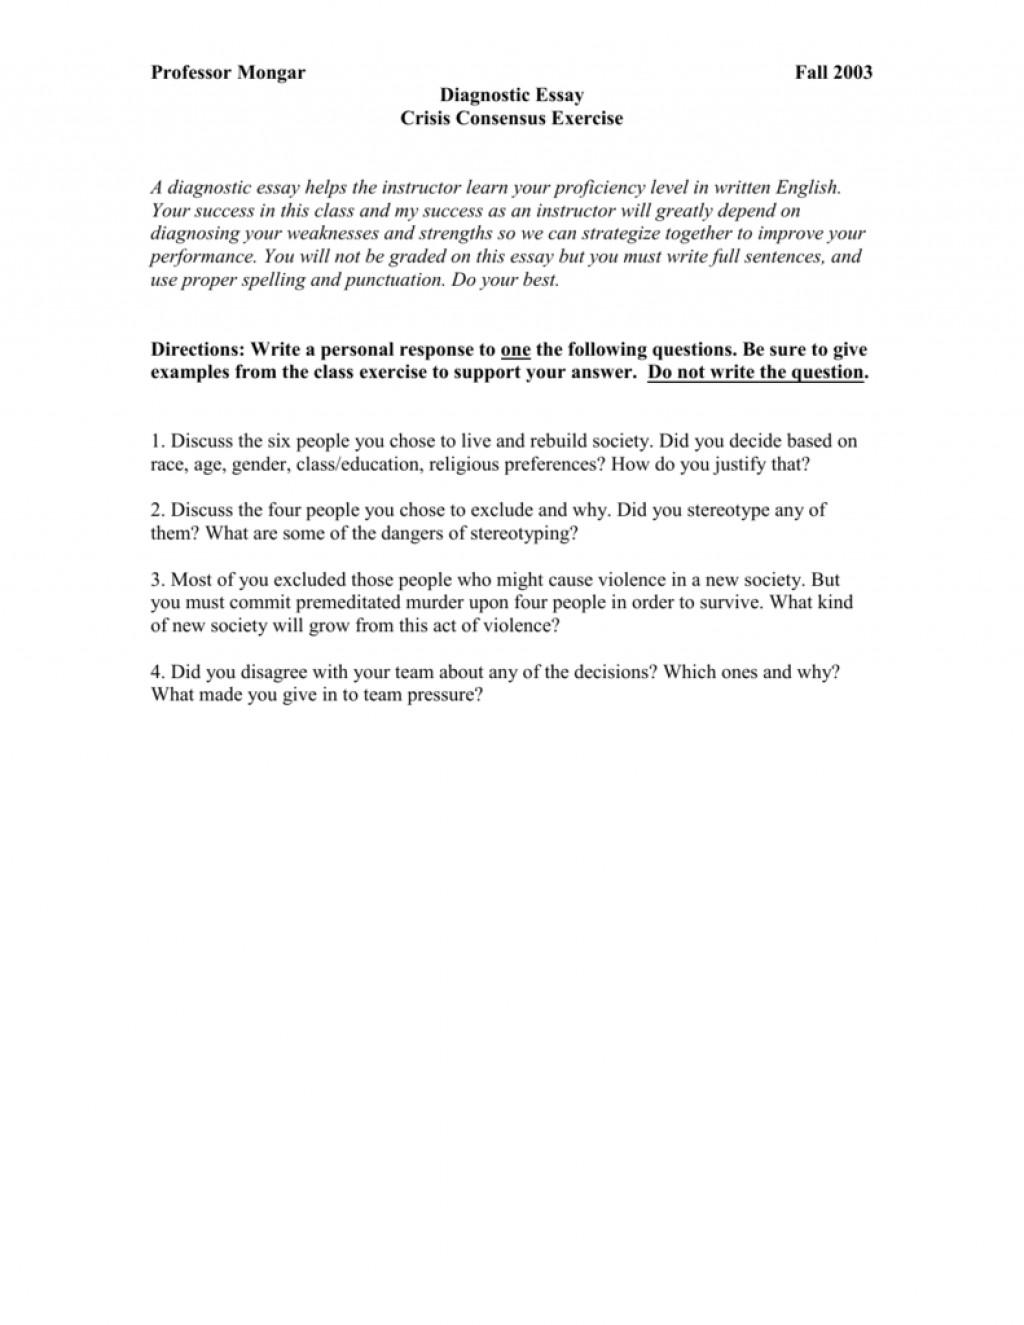 013 008051743 1 Diagnostic Essay Wondrous Introduction Writing Prompts High School Large